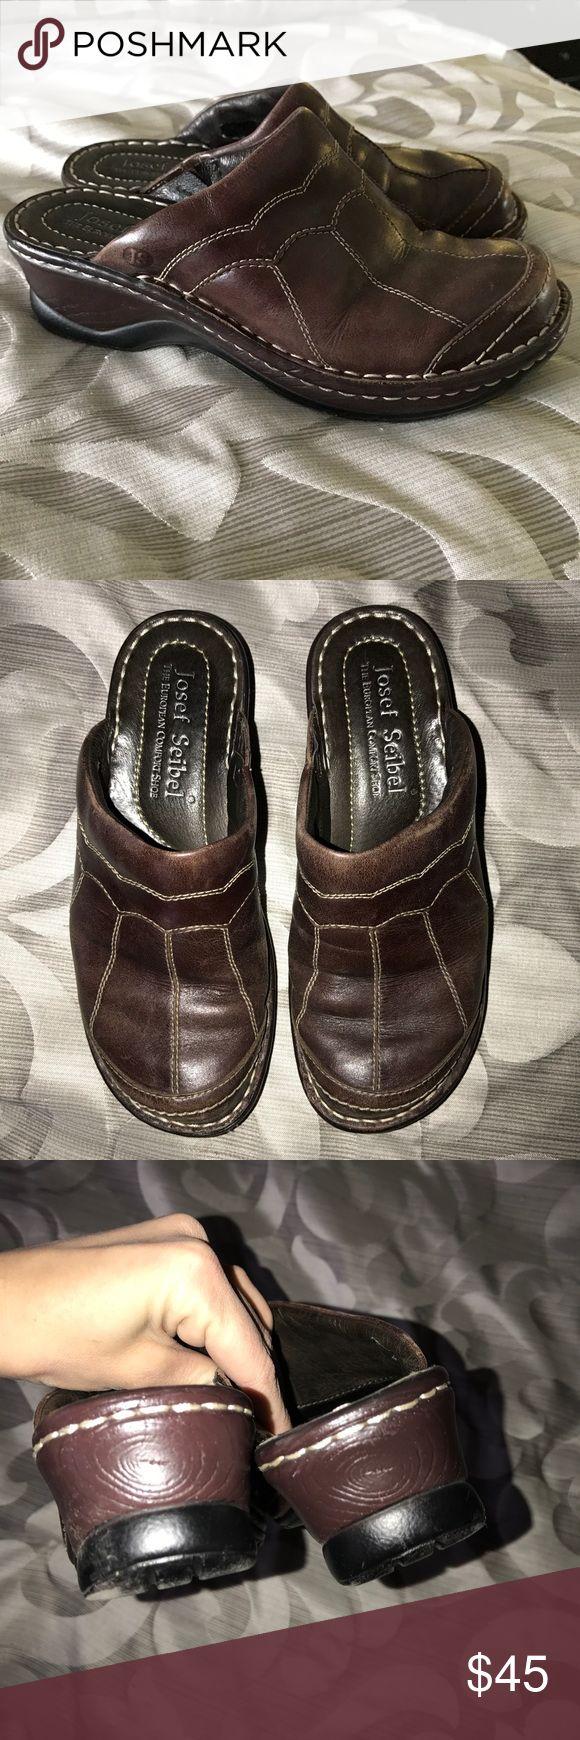 Josef Seibel Clog Shoes Size 36 Josef Seibel Shoes Mules & Clogs